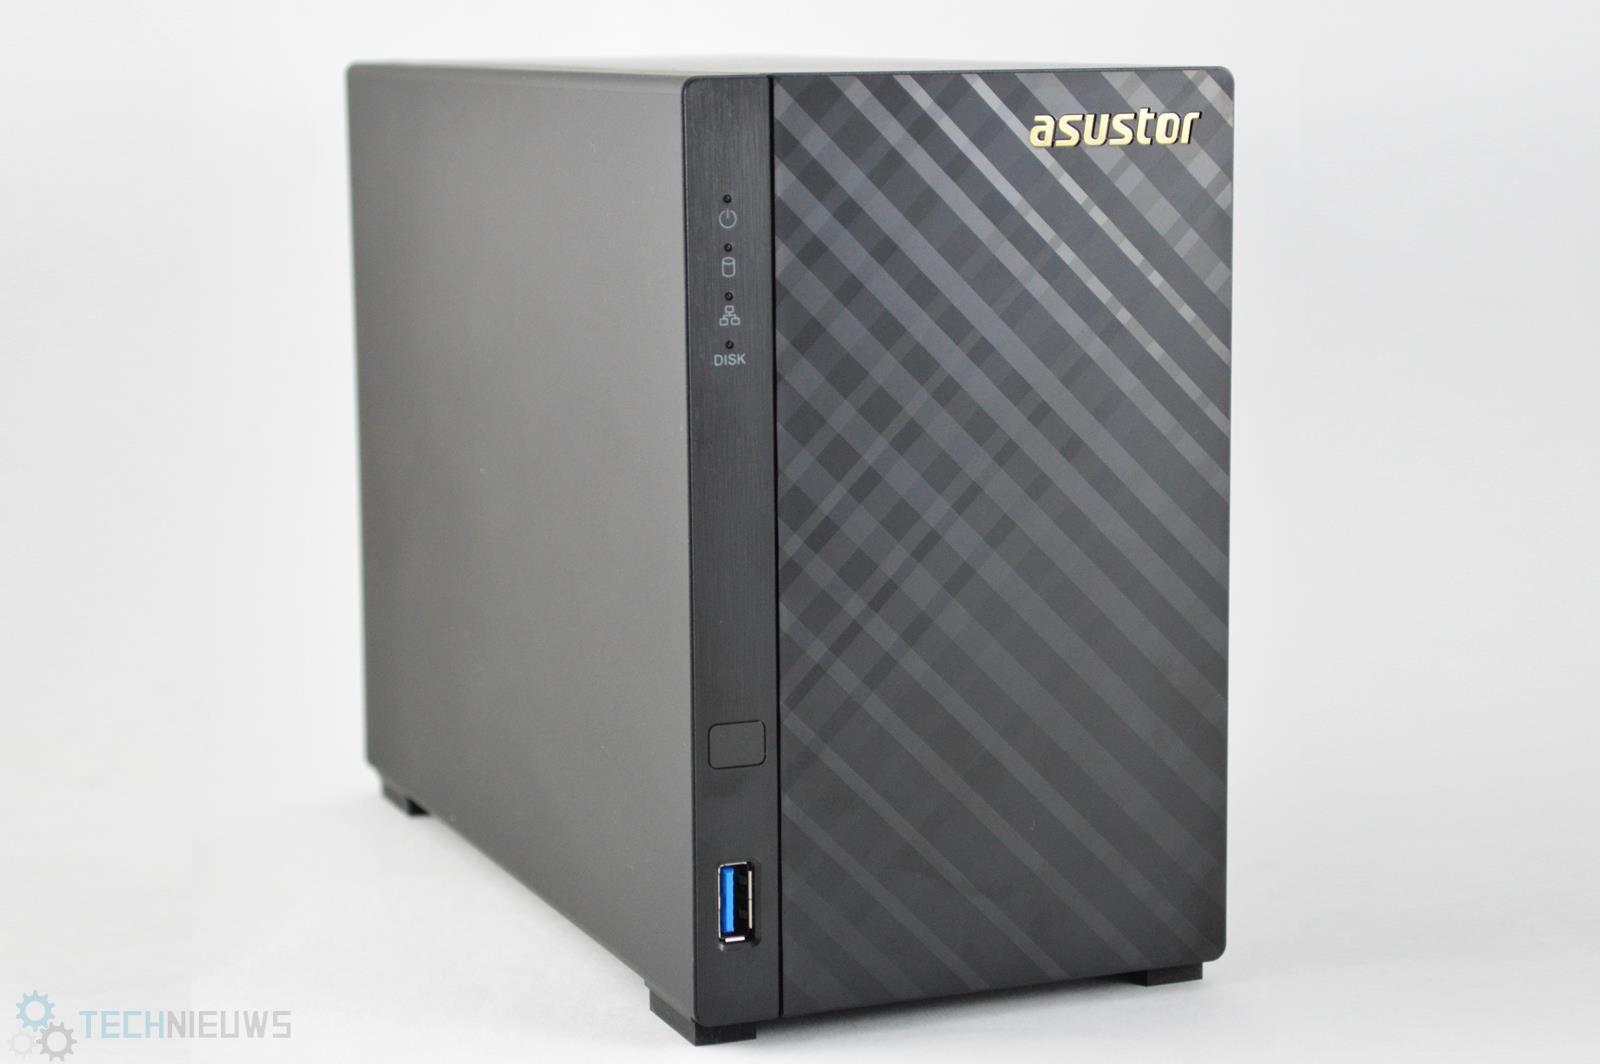 Asustor-AS1002T-1